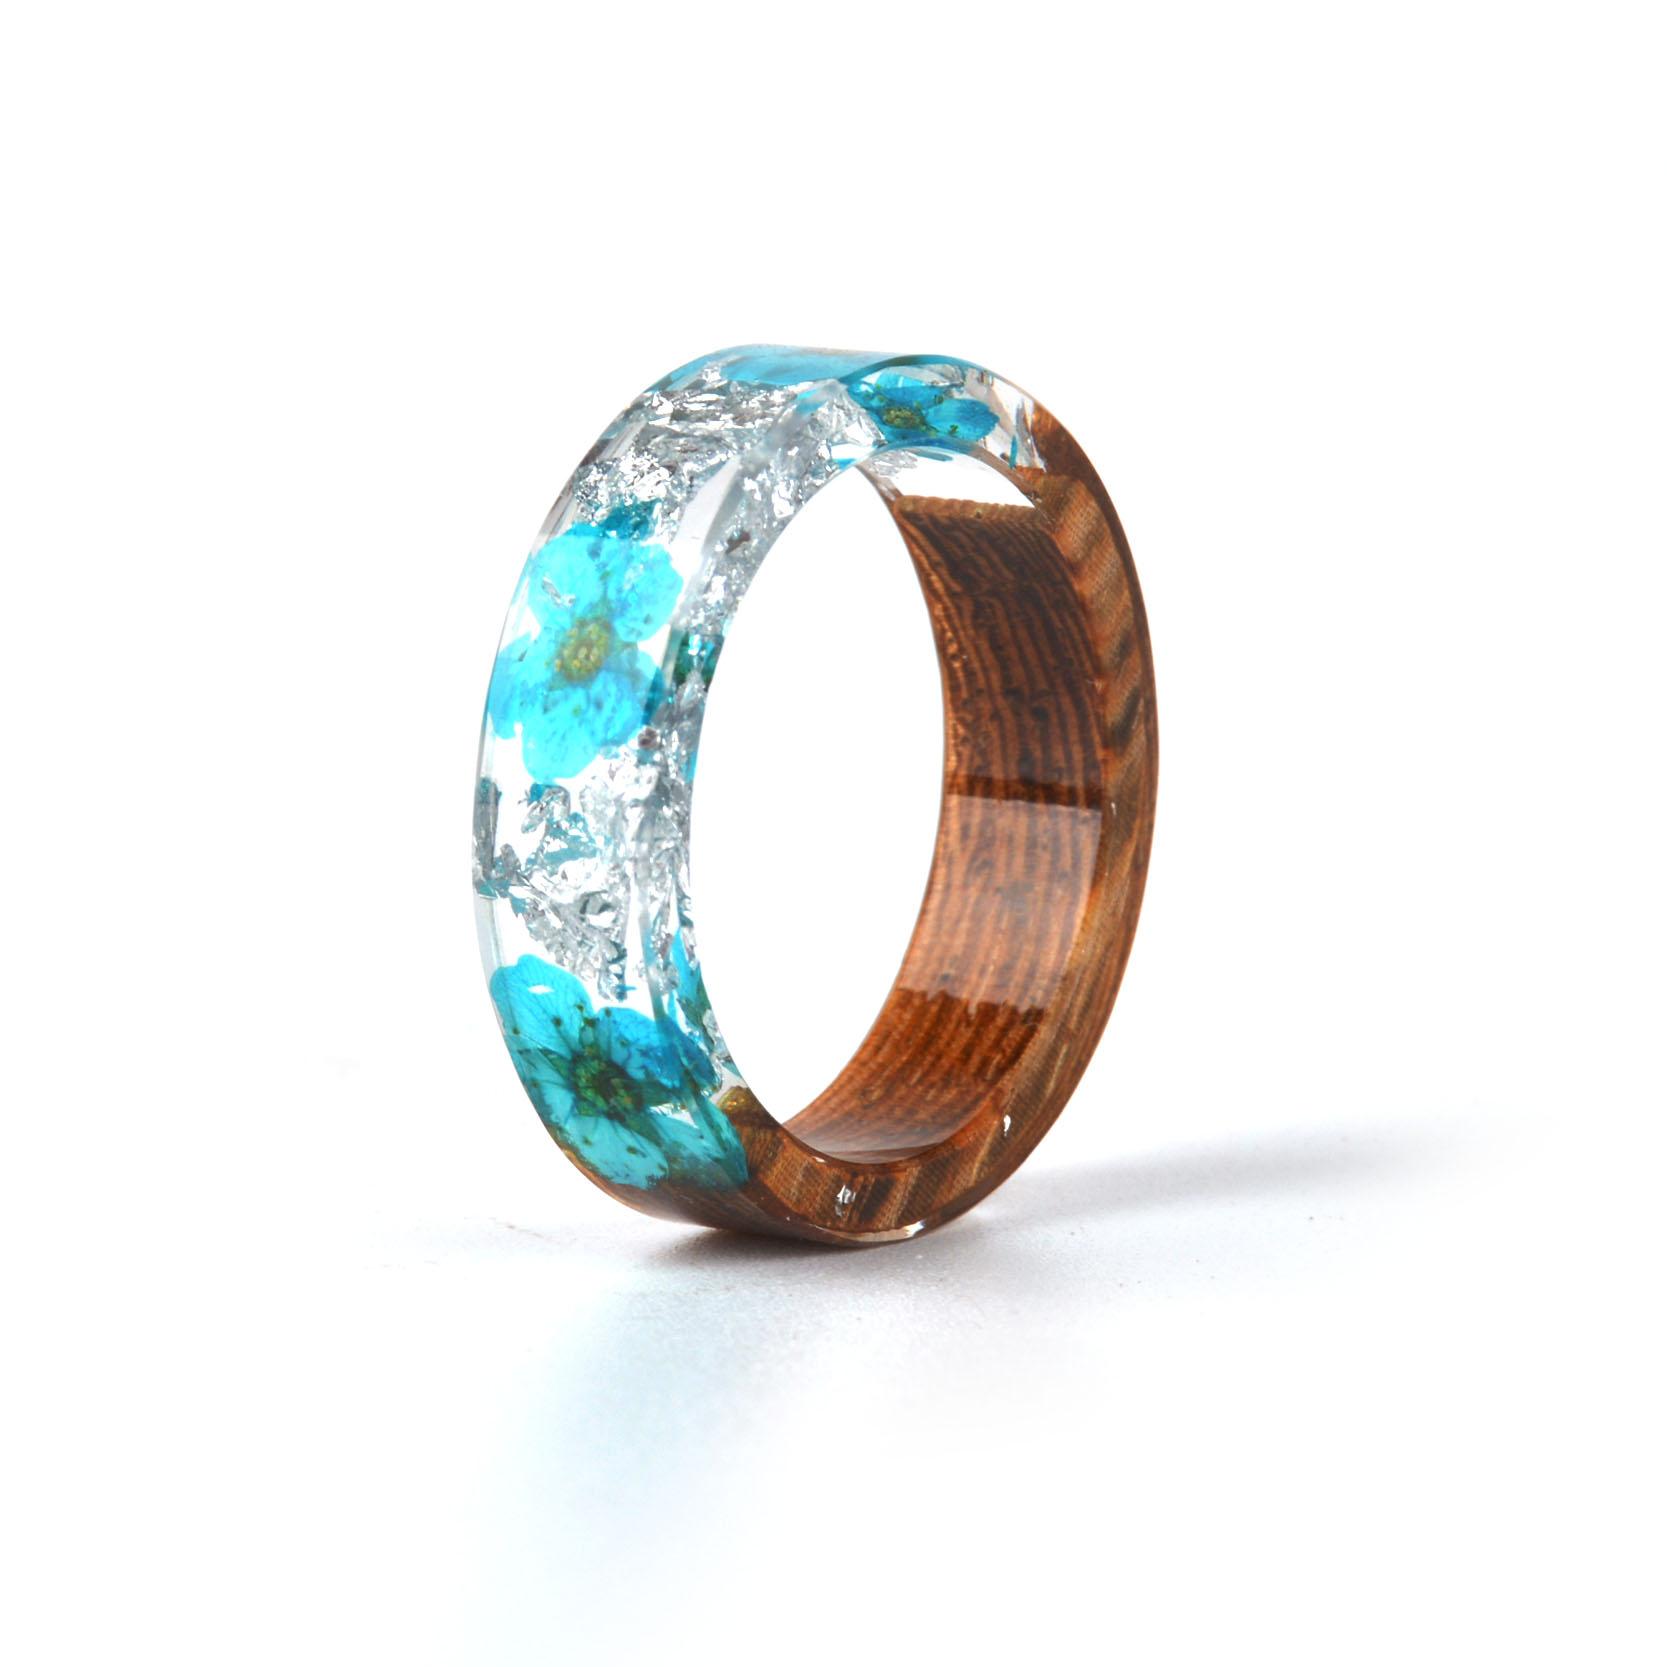 Handmade Wood Resin Ring Many Styles 31